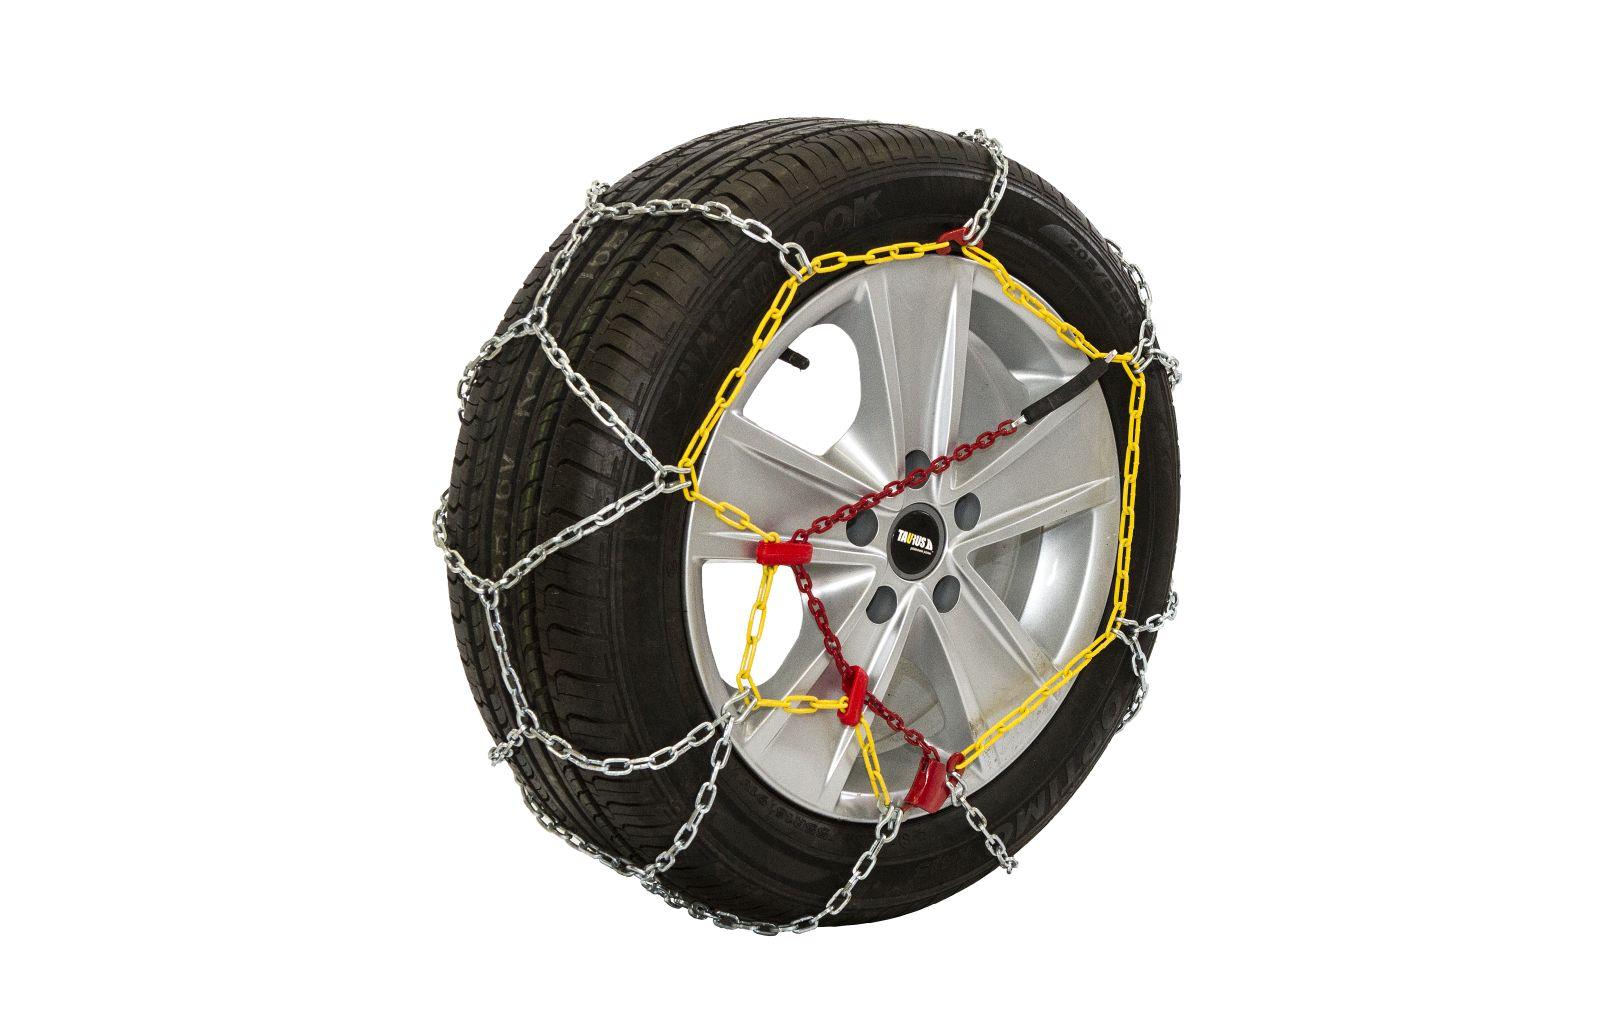 Комплект цепей противоскольжения Taurus 4x4 225 ВЗЦ-16мм ( звено ДСЗ 4,5мм ) с защитой литых дисков, Цепи на колёса Taurus Diament T4х4225